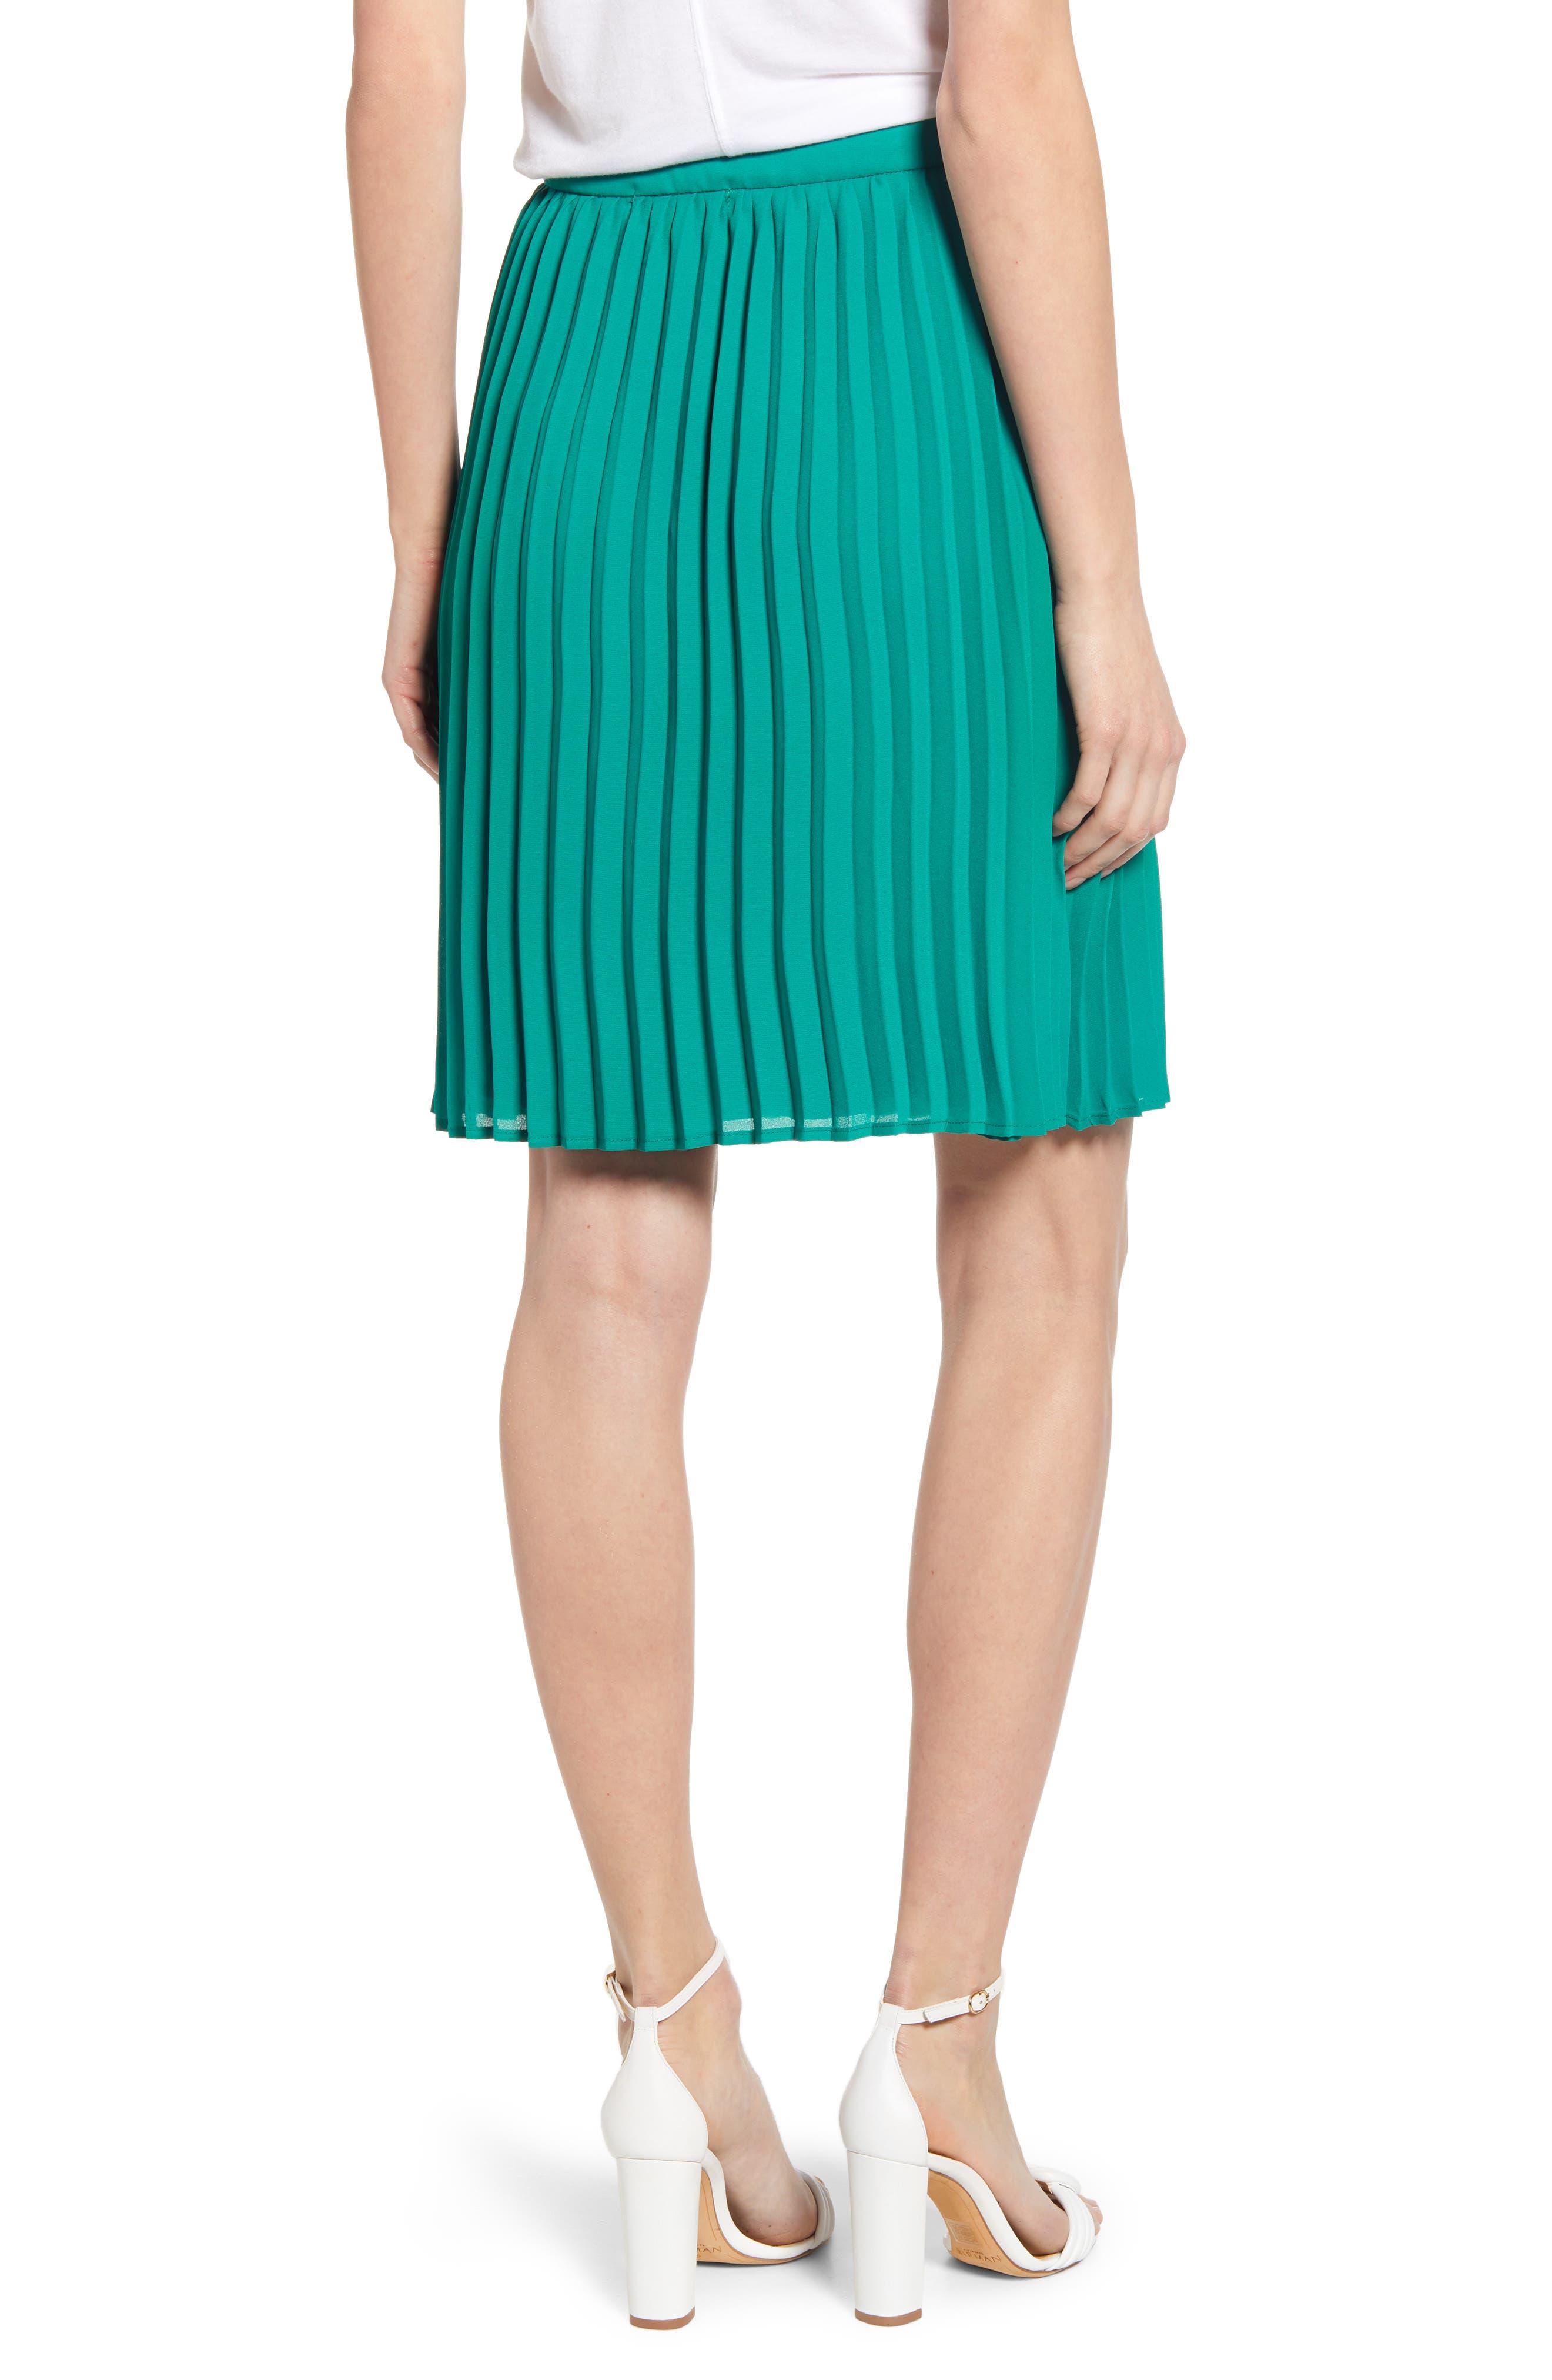 GIBSON, x International Women's Day Thamarr Pleated Skirt, Alternate thumbnail 2, color, GREEN